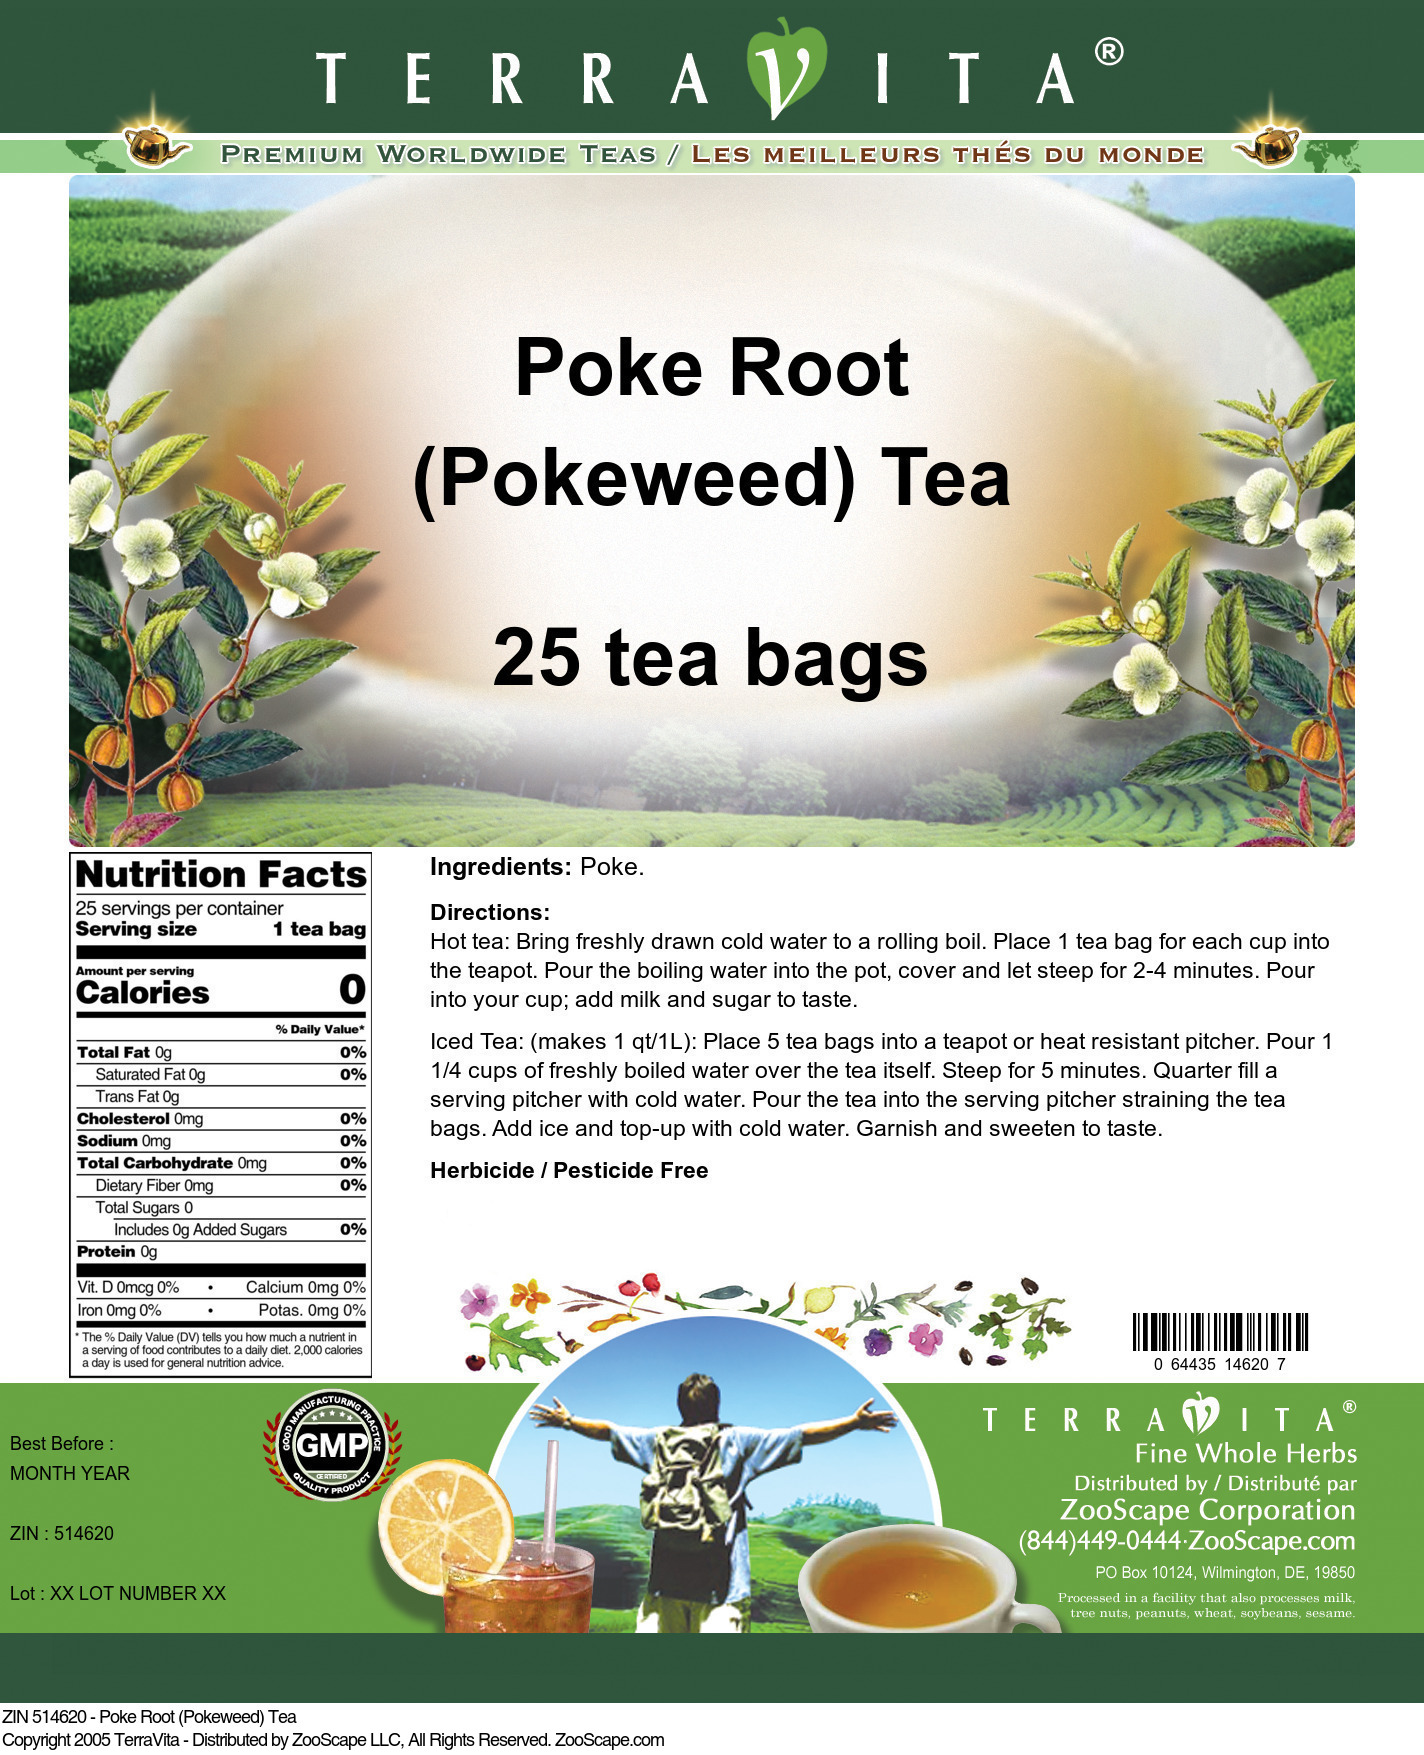 Poke Root (Pokeweed) Tea